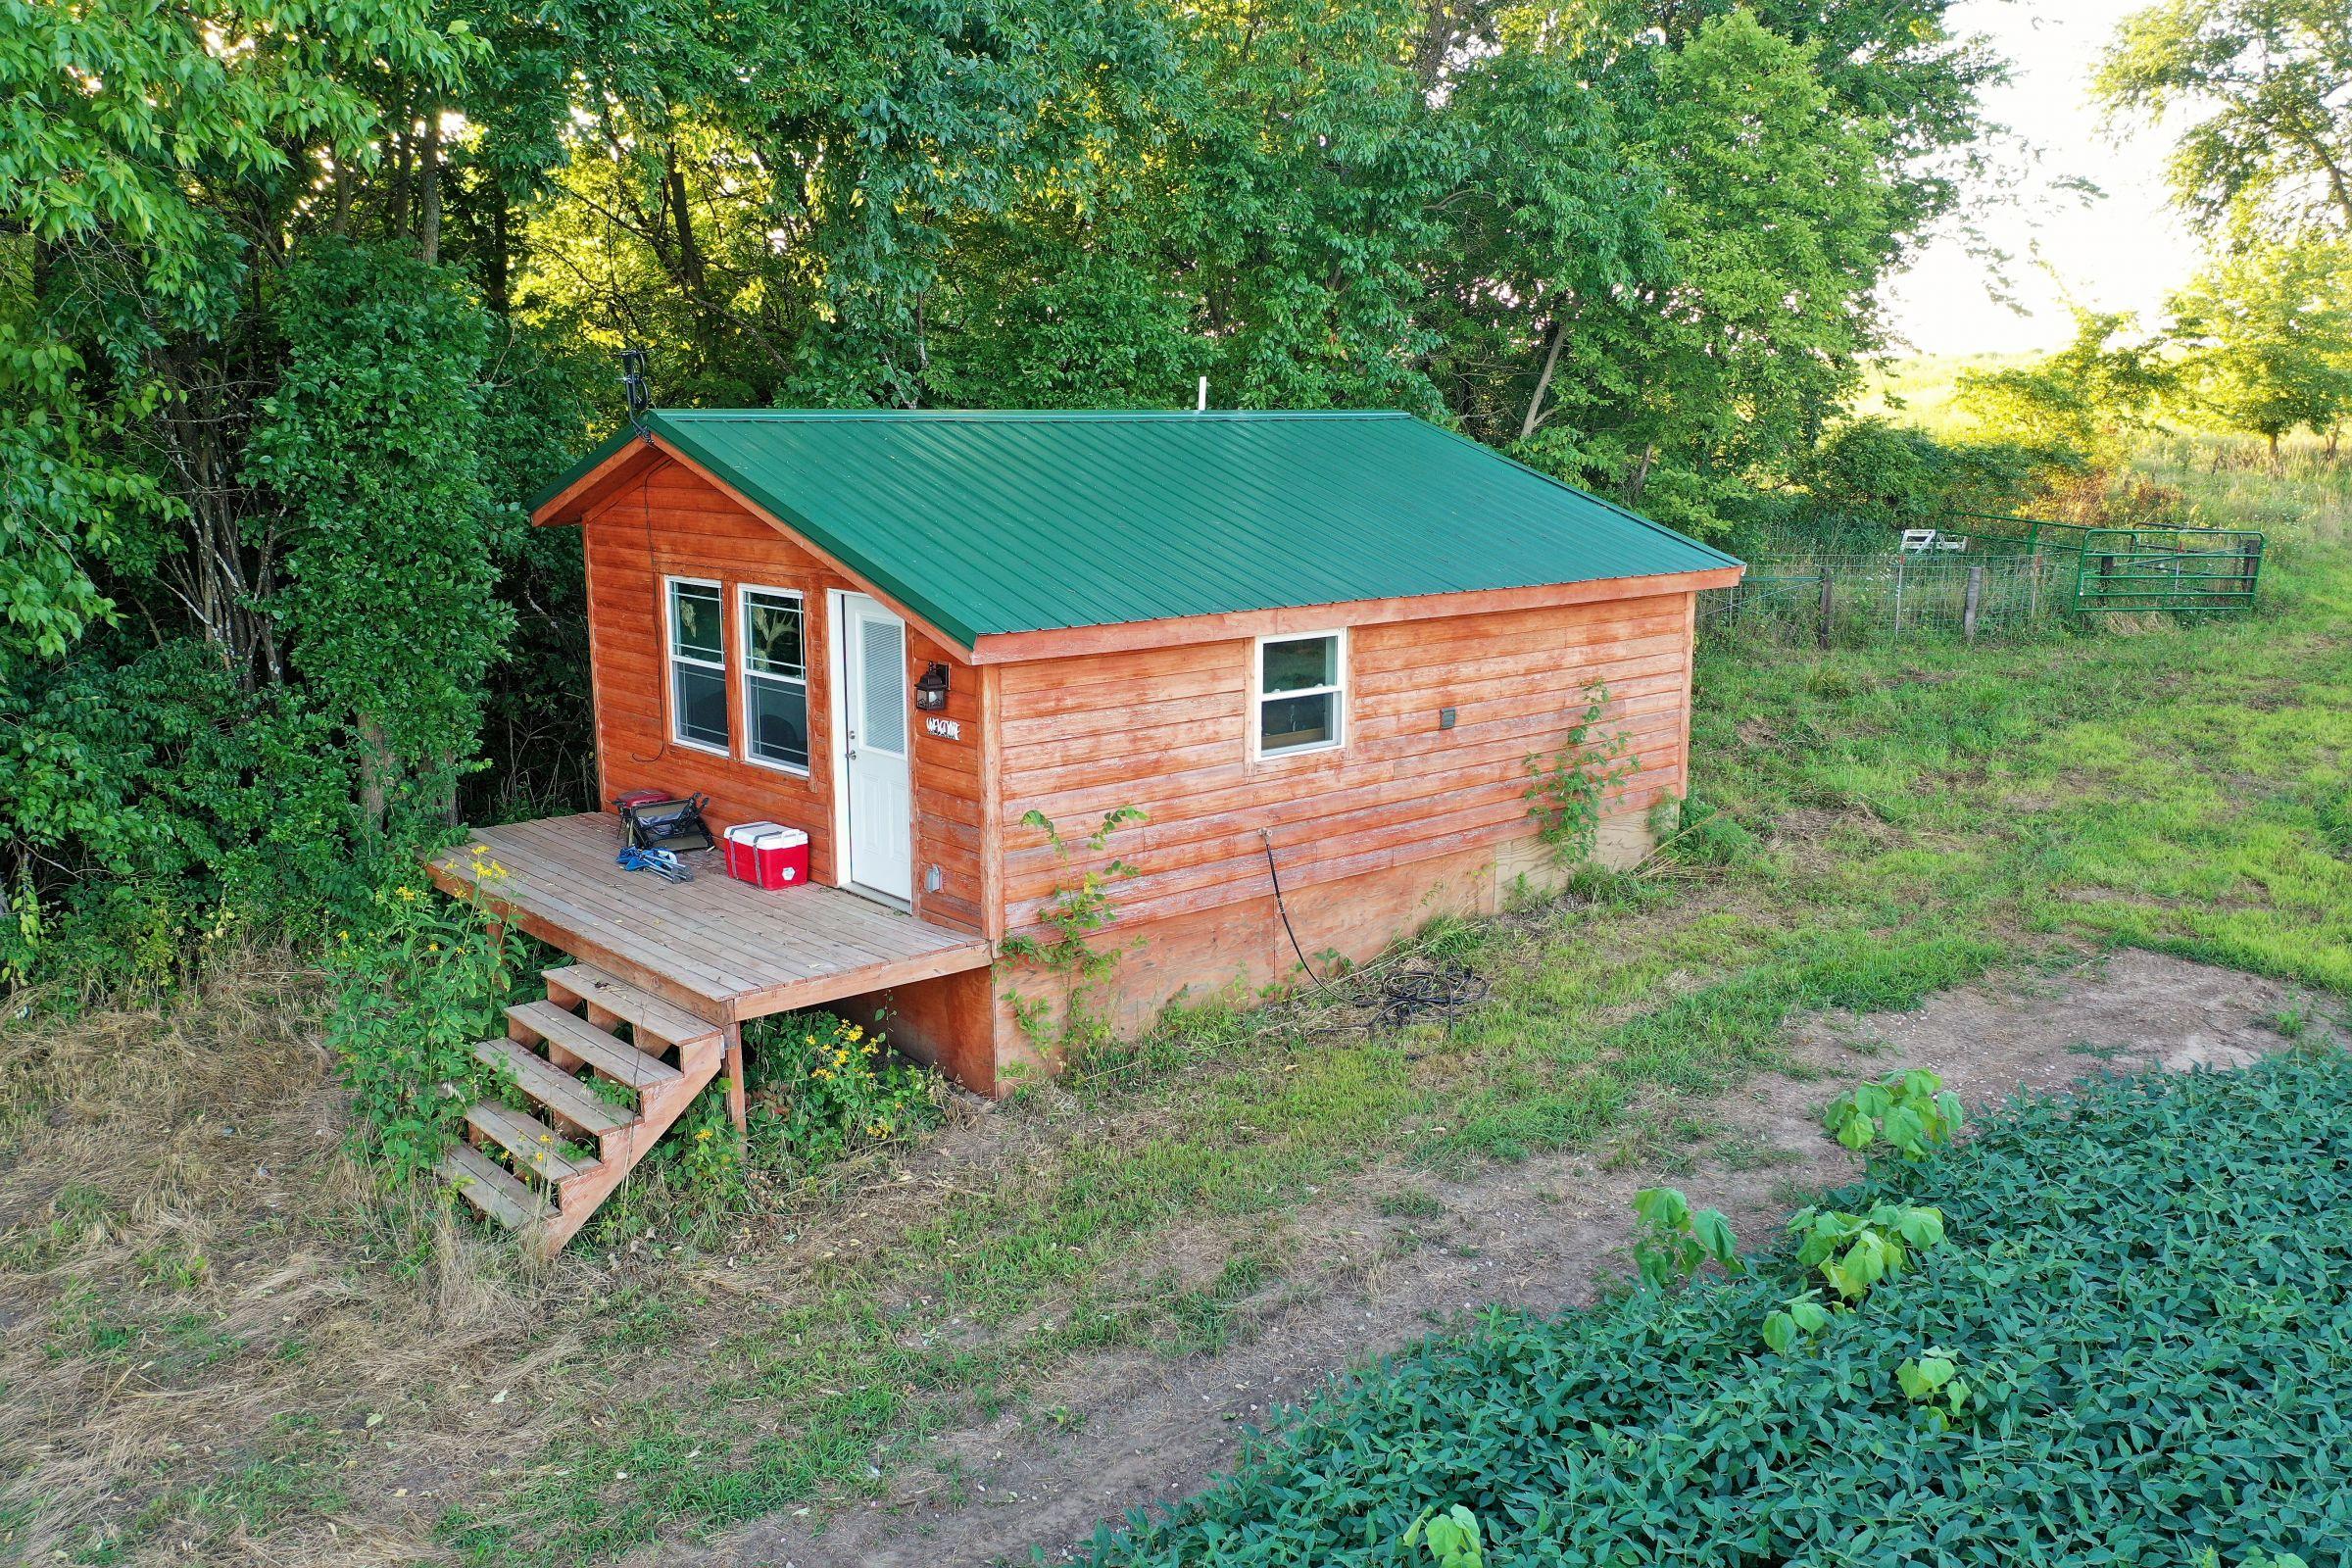 land-clarke-county-iowa-325-acres-listing-number-15416-2-2021-03-18-162752.JPG